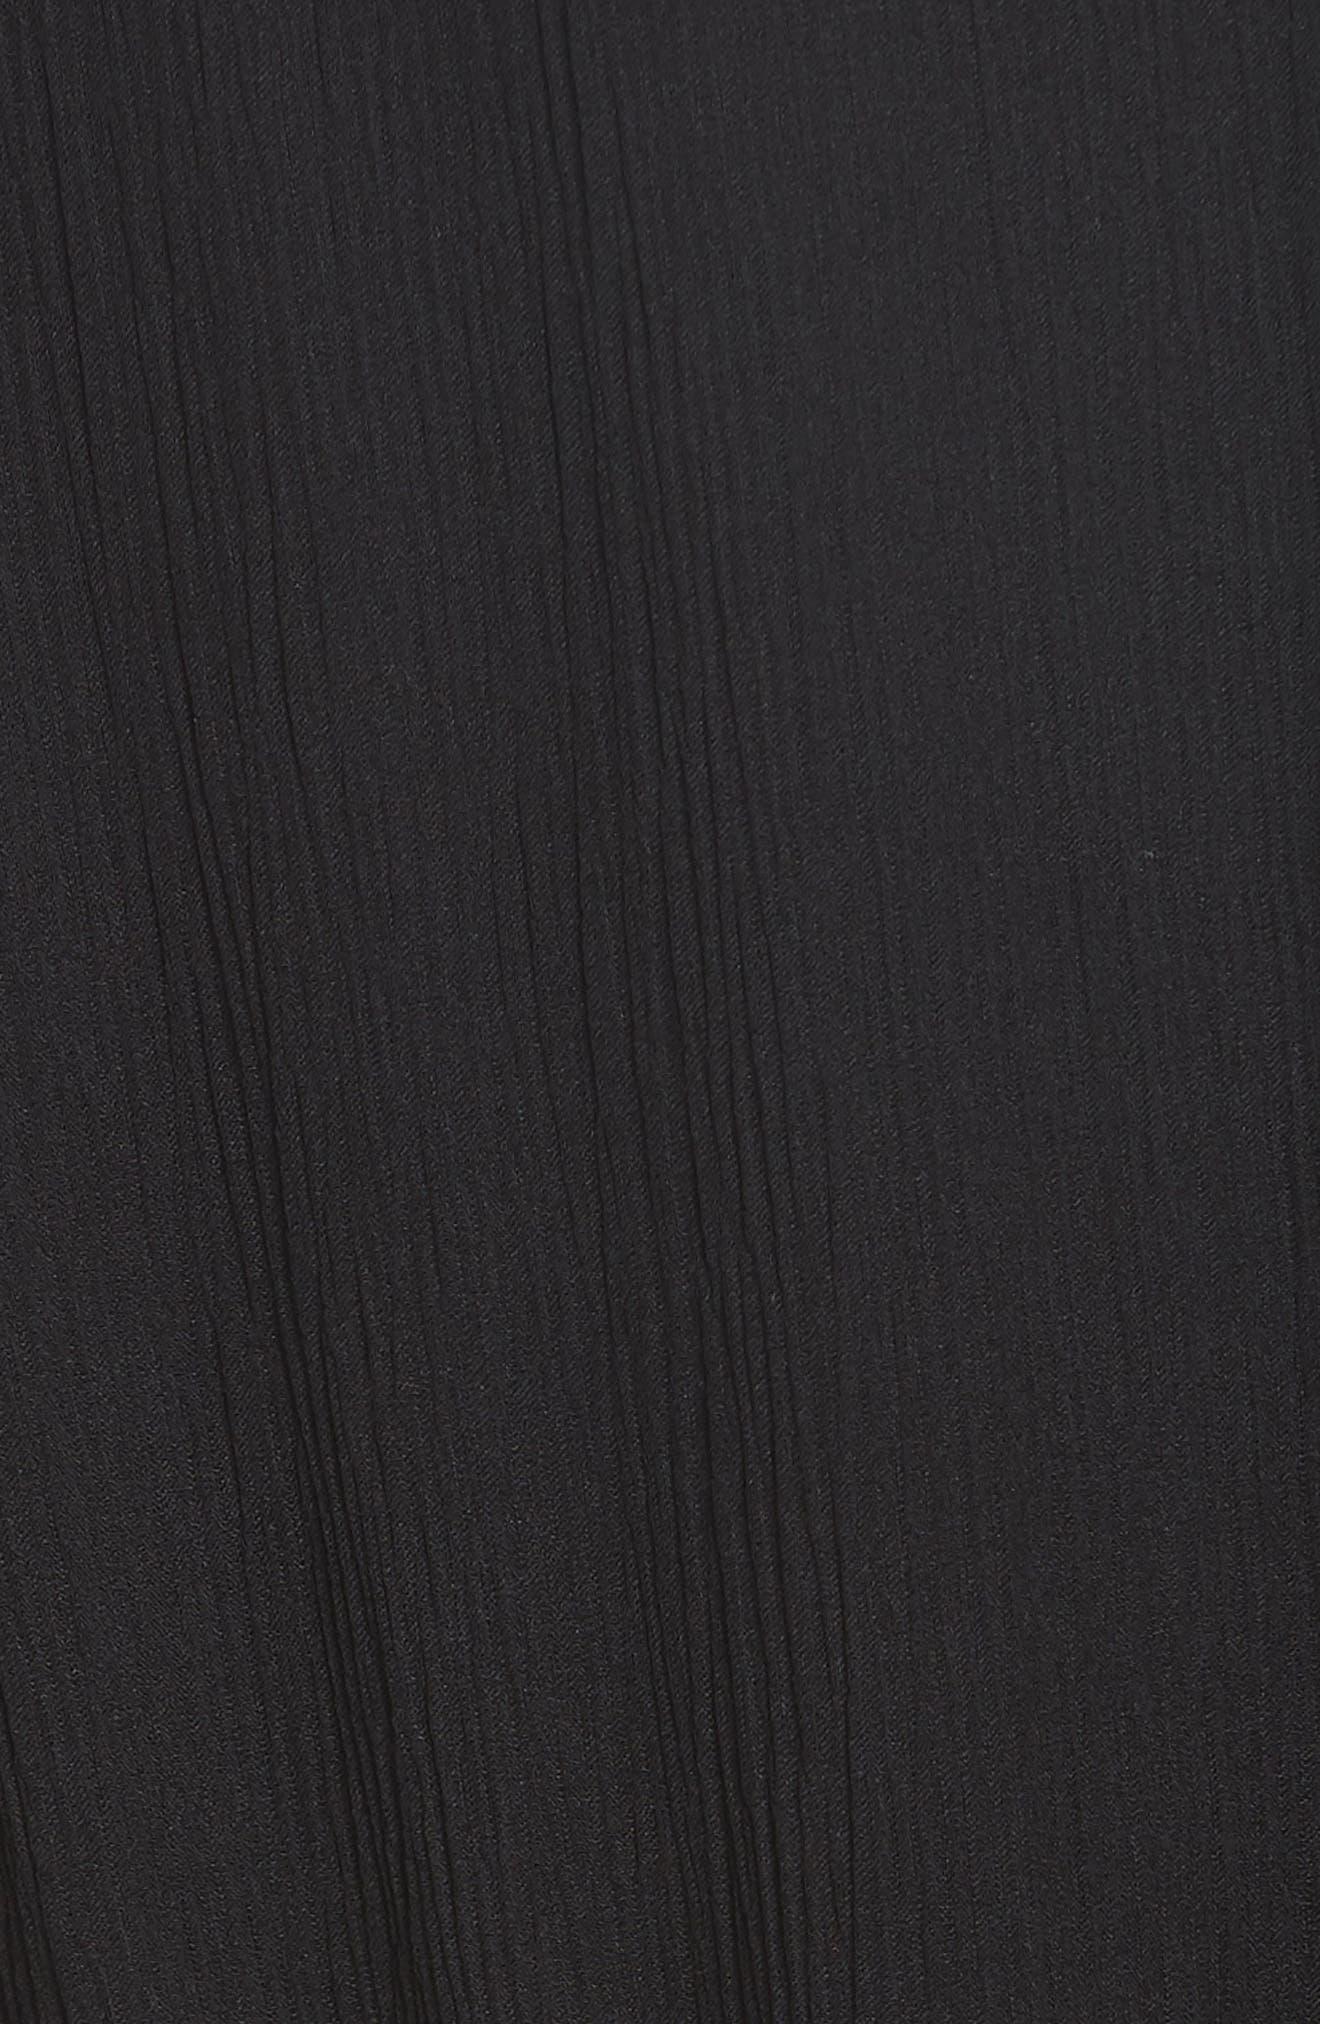 RAG & BONE, Dinah Silk Dress, Alternate thumbnail 6, color, 001